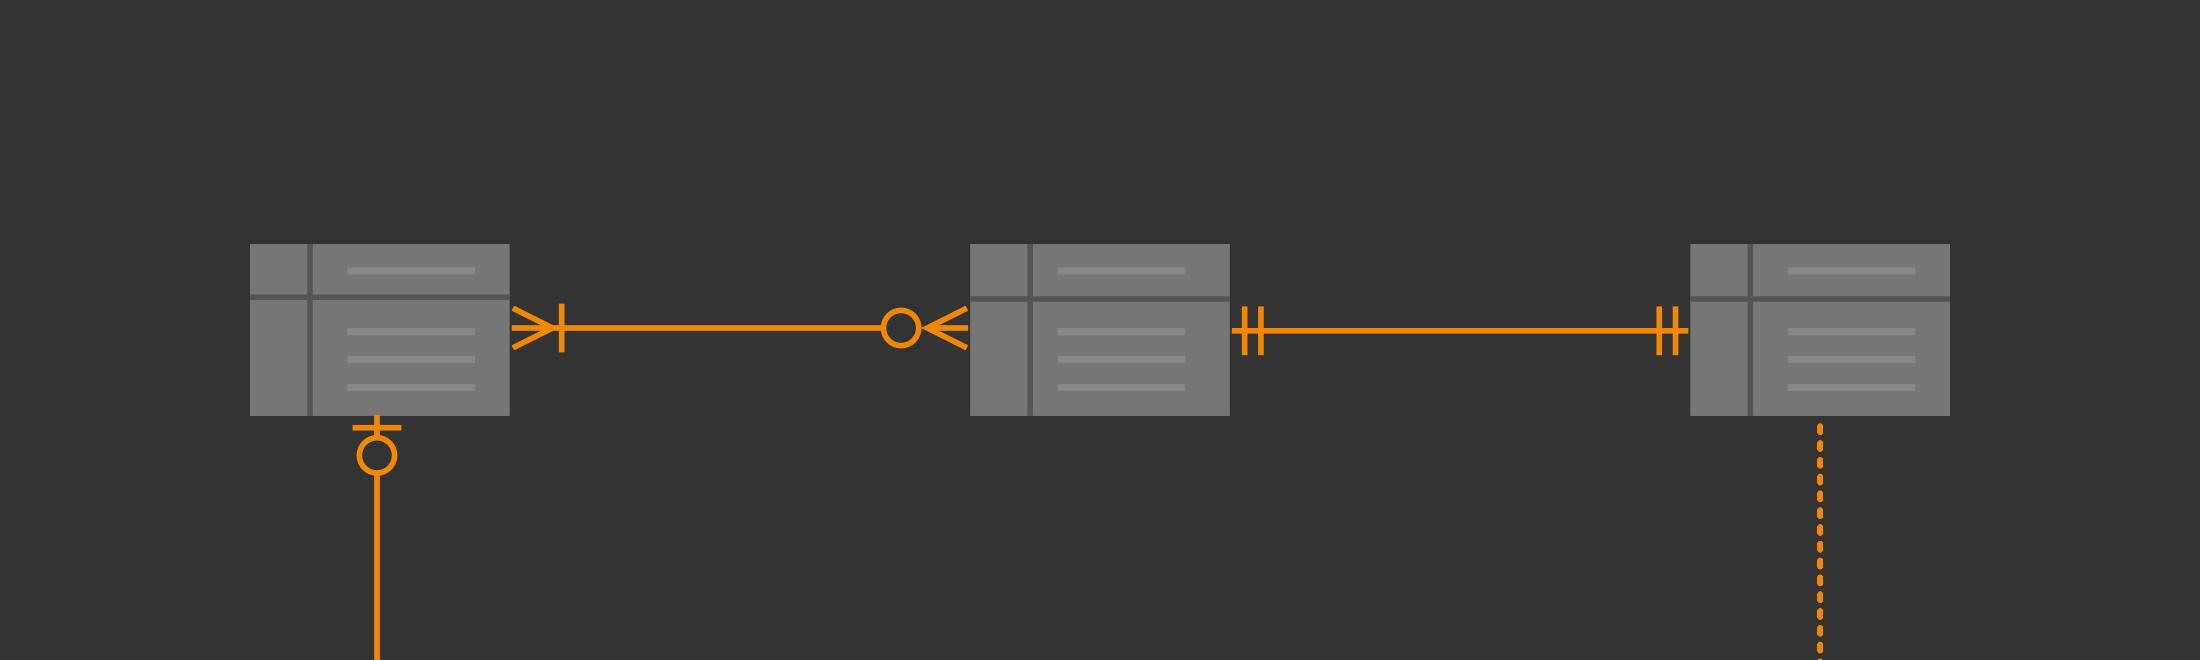 Entity Relationship Diagrams With Draw.io – Draw.io in How To Draw Entity Relationship Diagram Example